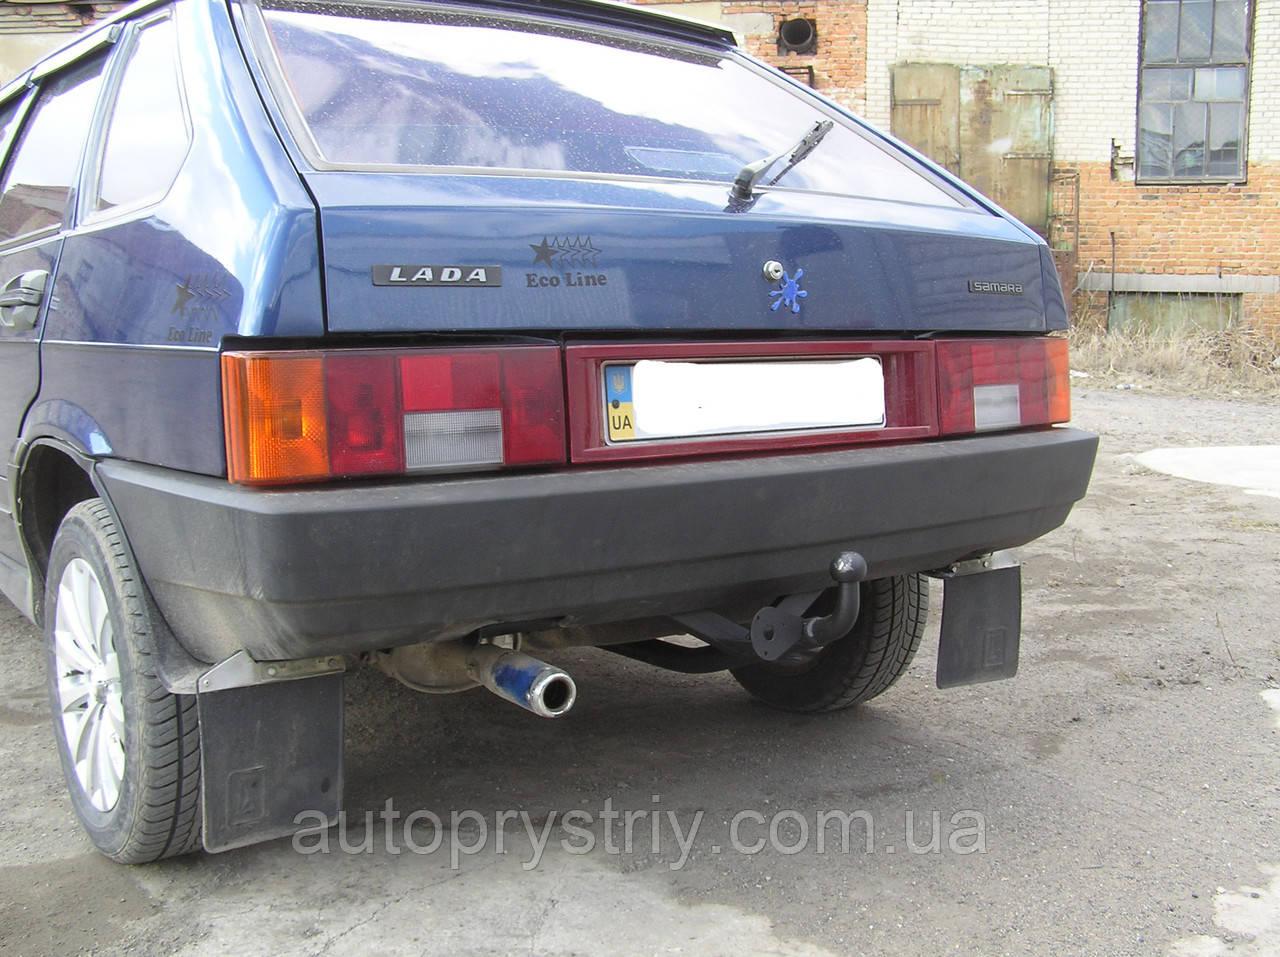 Фаркоп - ВАЗ-2109 Lada Хэтчбек (1987-2011) сварной